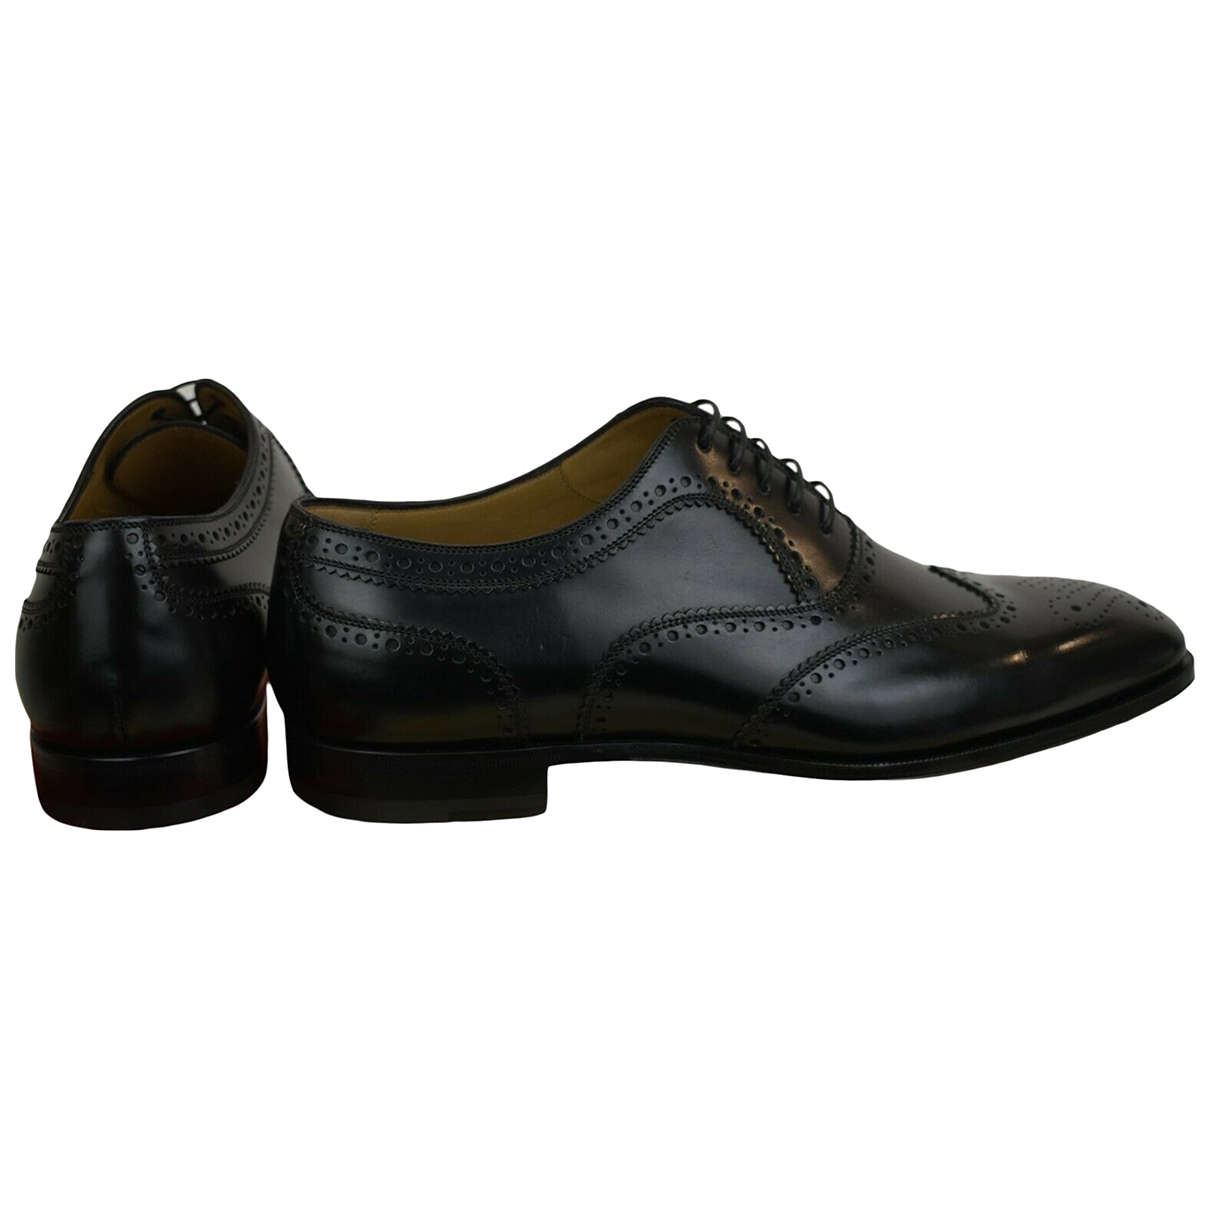 Christian Louboutin \N Black Leather Lace ups for Men 40 EU